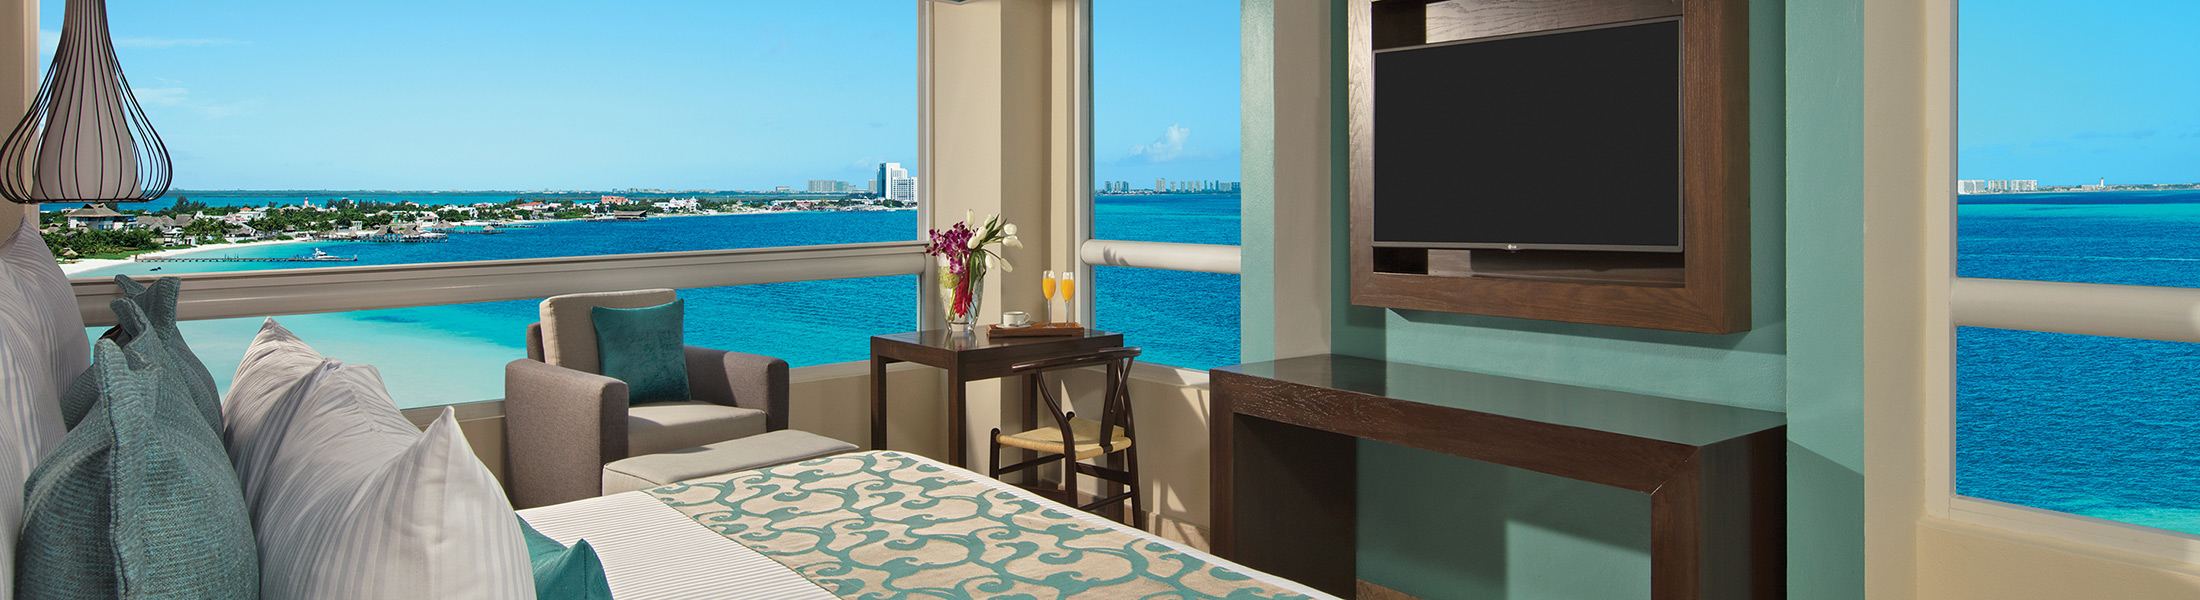 Bedroom with ocean views at Dreams Sands Cancun Resort & Spa